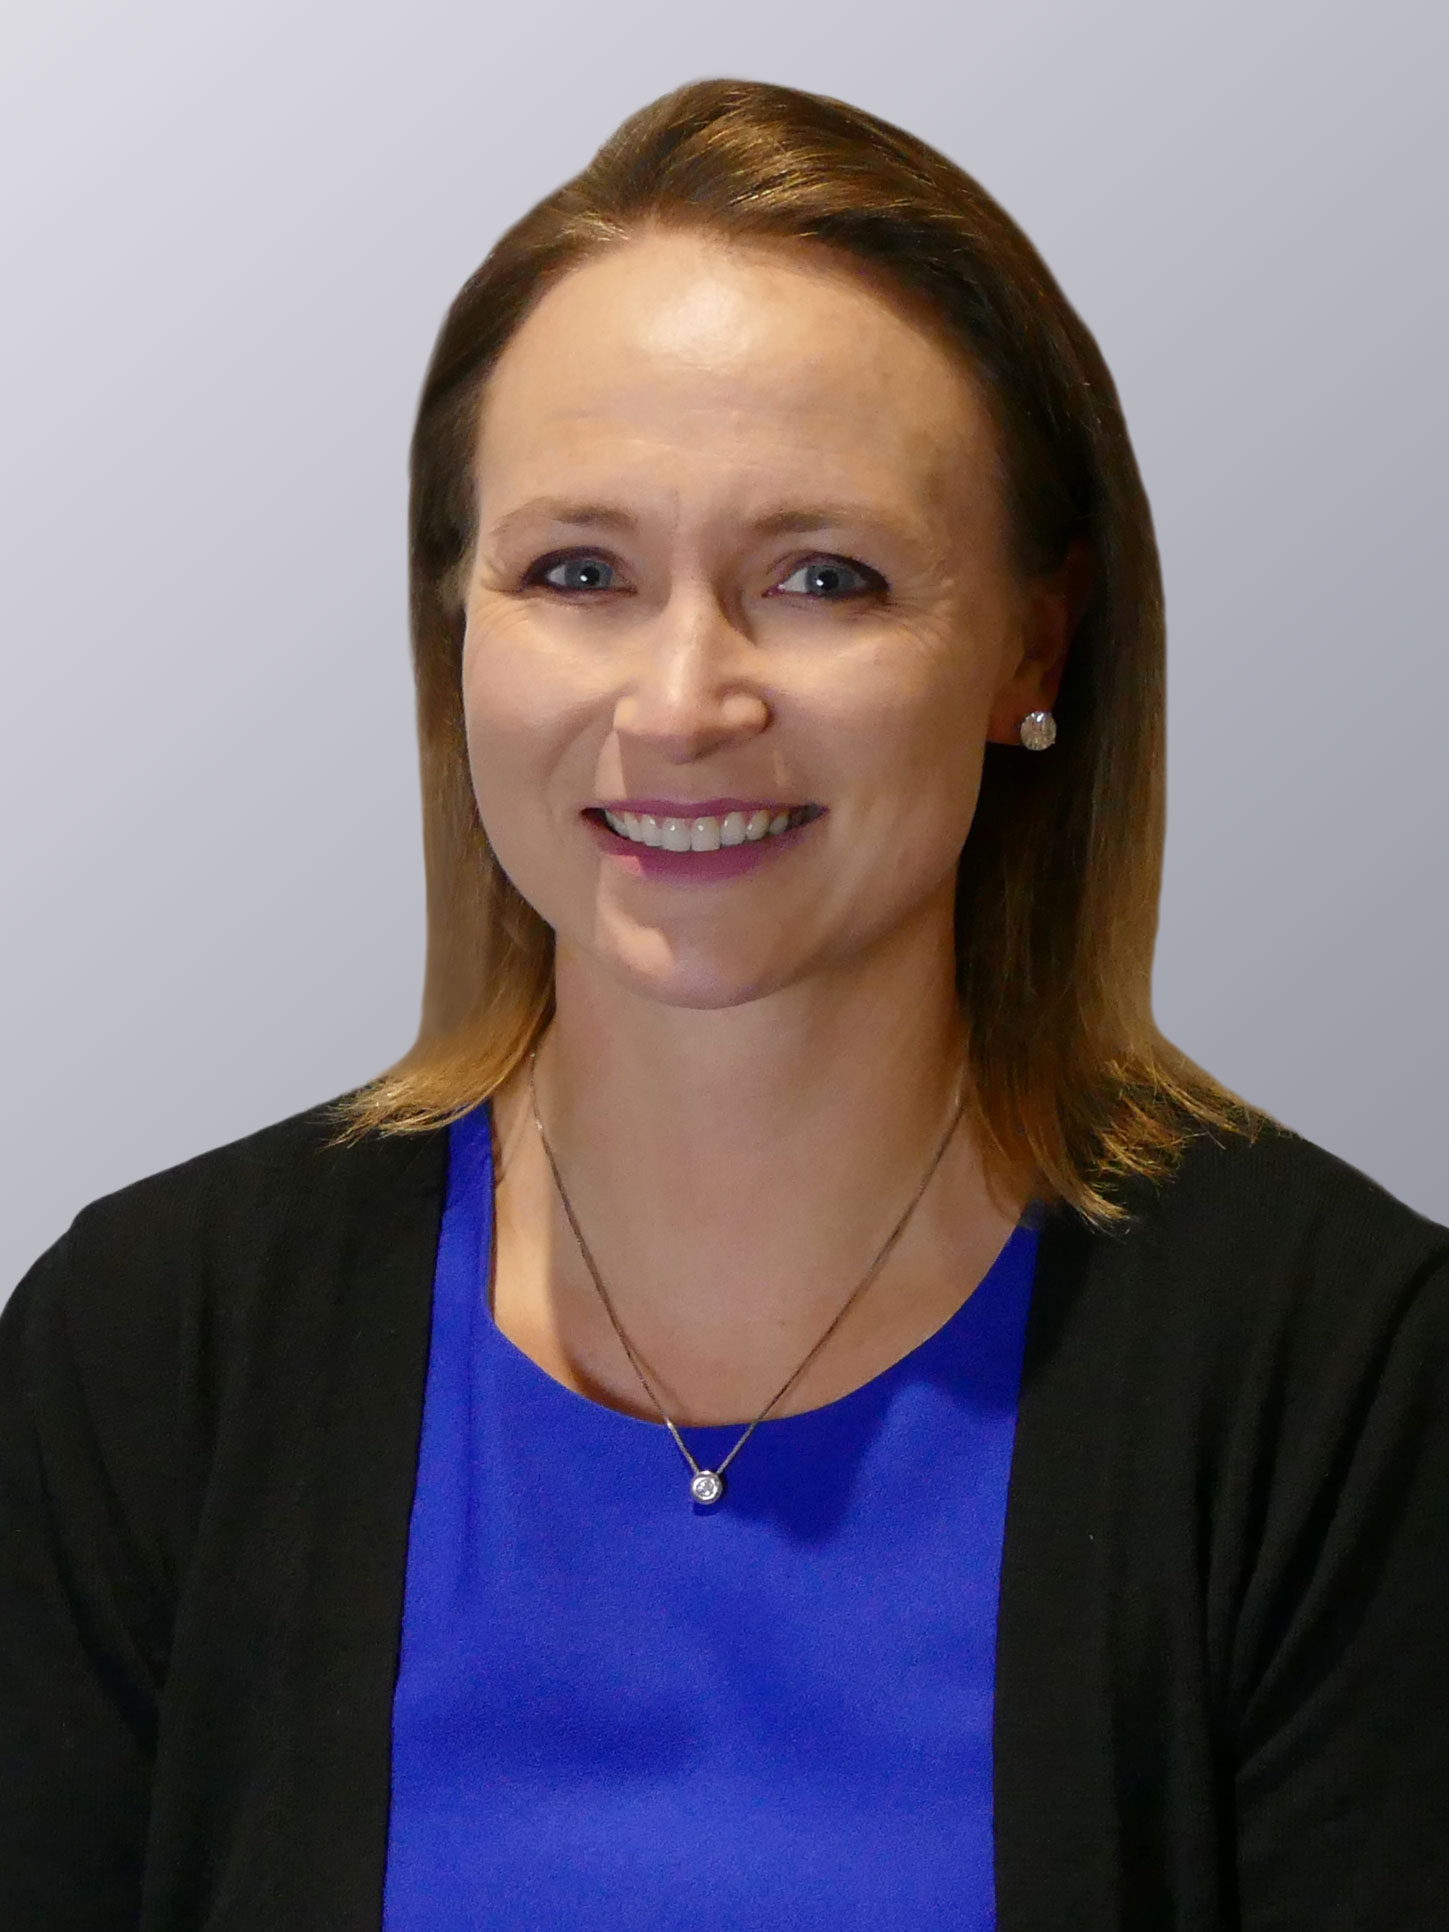 Abigail Koppes